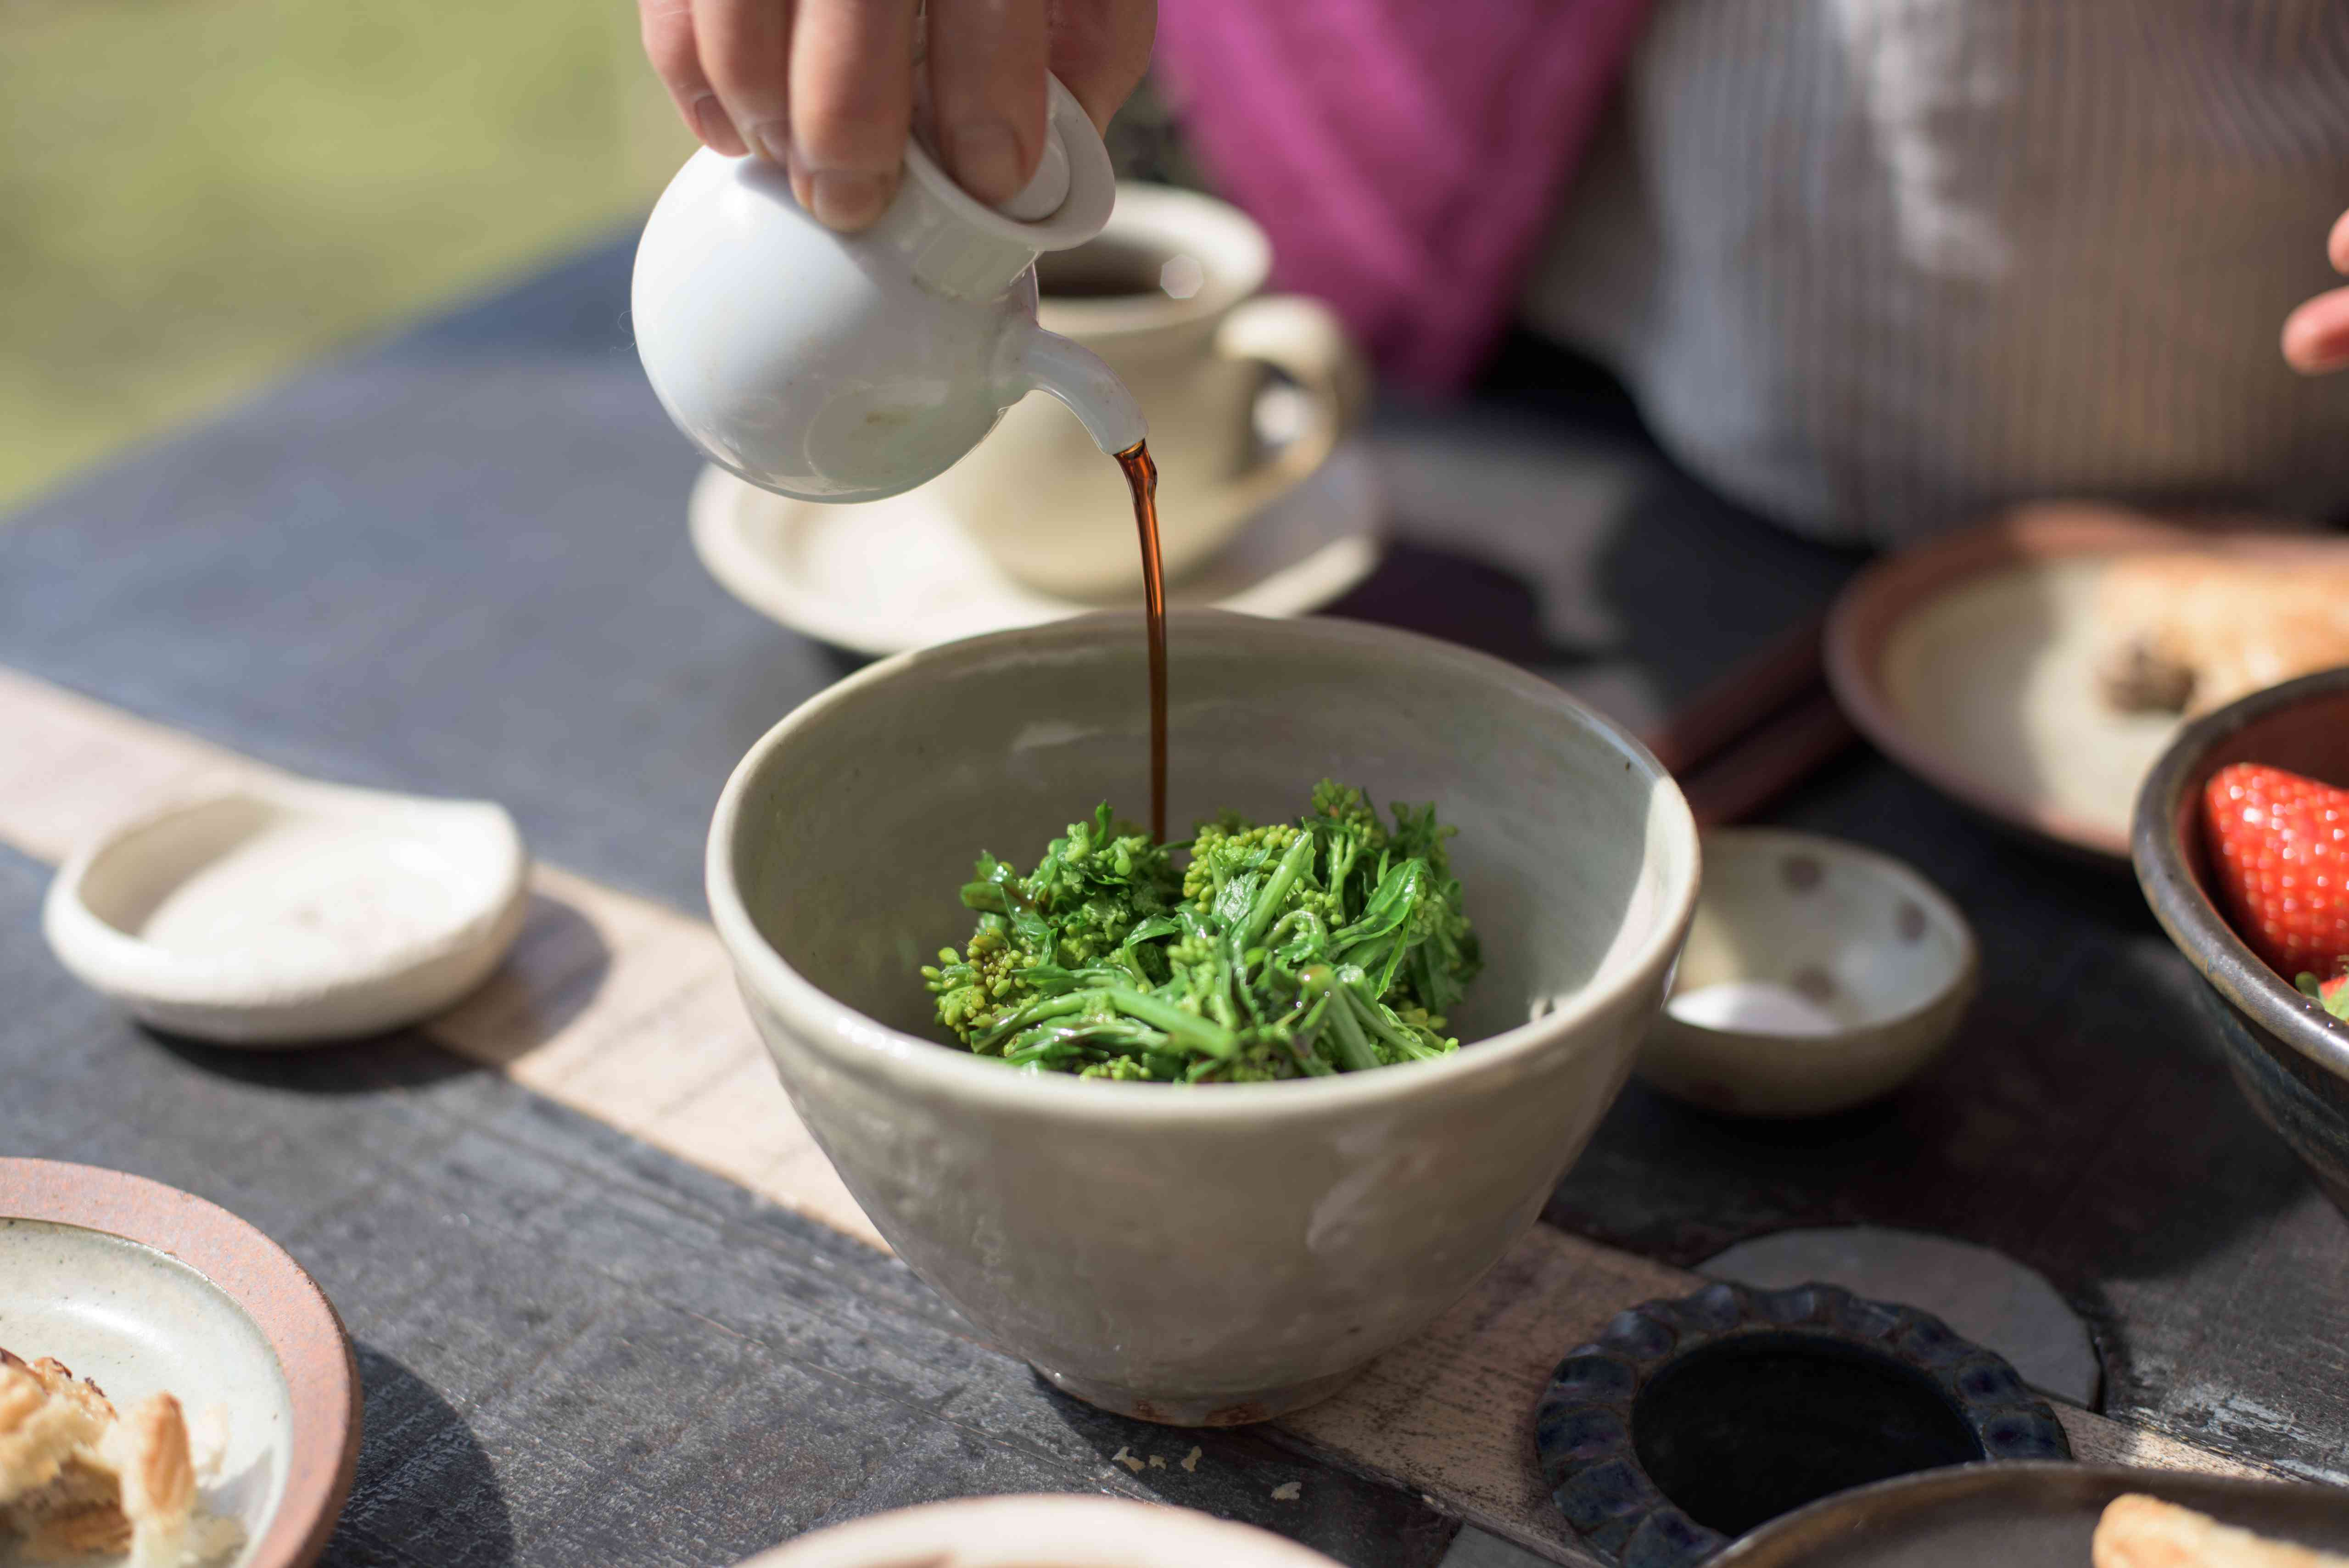 Japanese style, Japanese food, Healthy diet